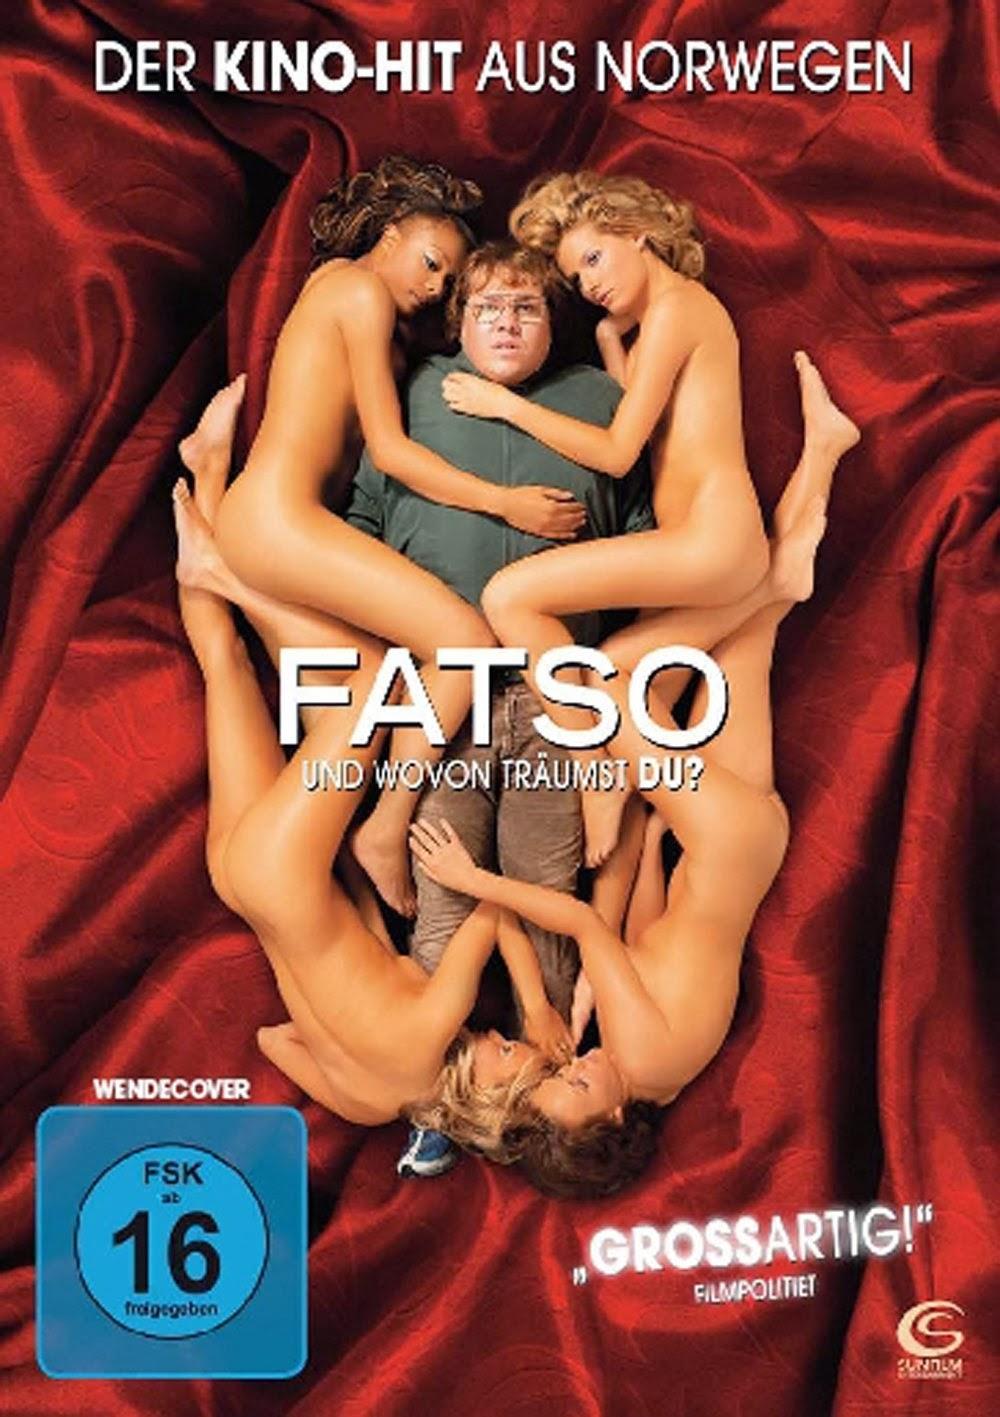 http://www.amazon.de/Fatso-Und-wovon-tr%C3%A4umst-du/dp/B0036U8T54/ref=sr_1_1?ie=UTF8&qid=1393765144&sr=8-1&keywords=fatso